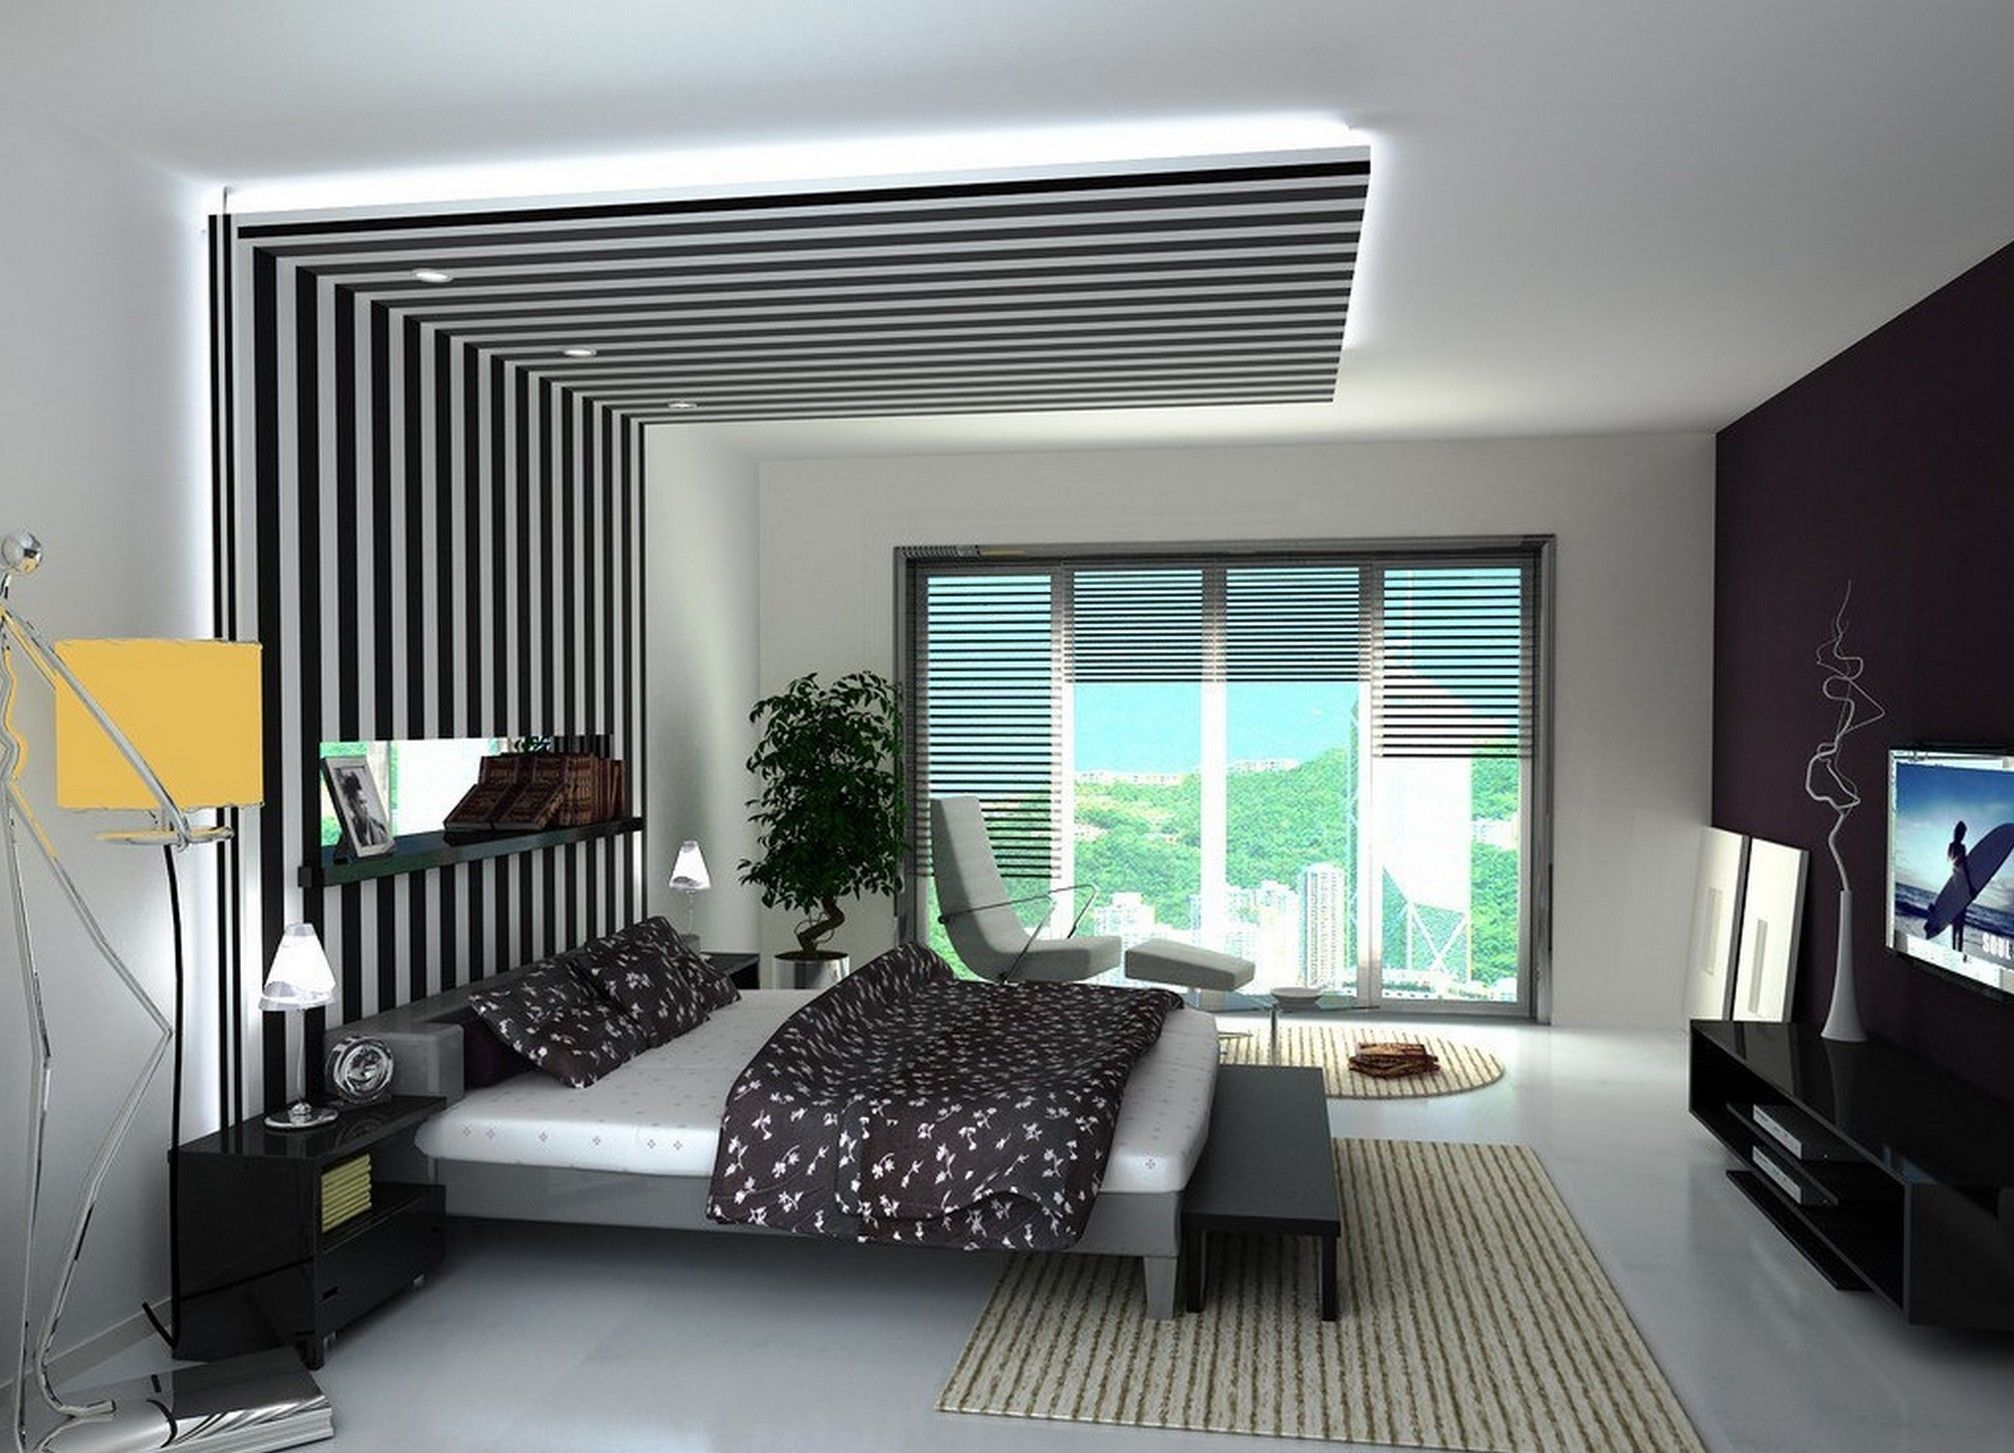 ديكور جبس بورد غرف نوم 2020 8